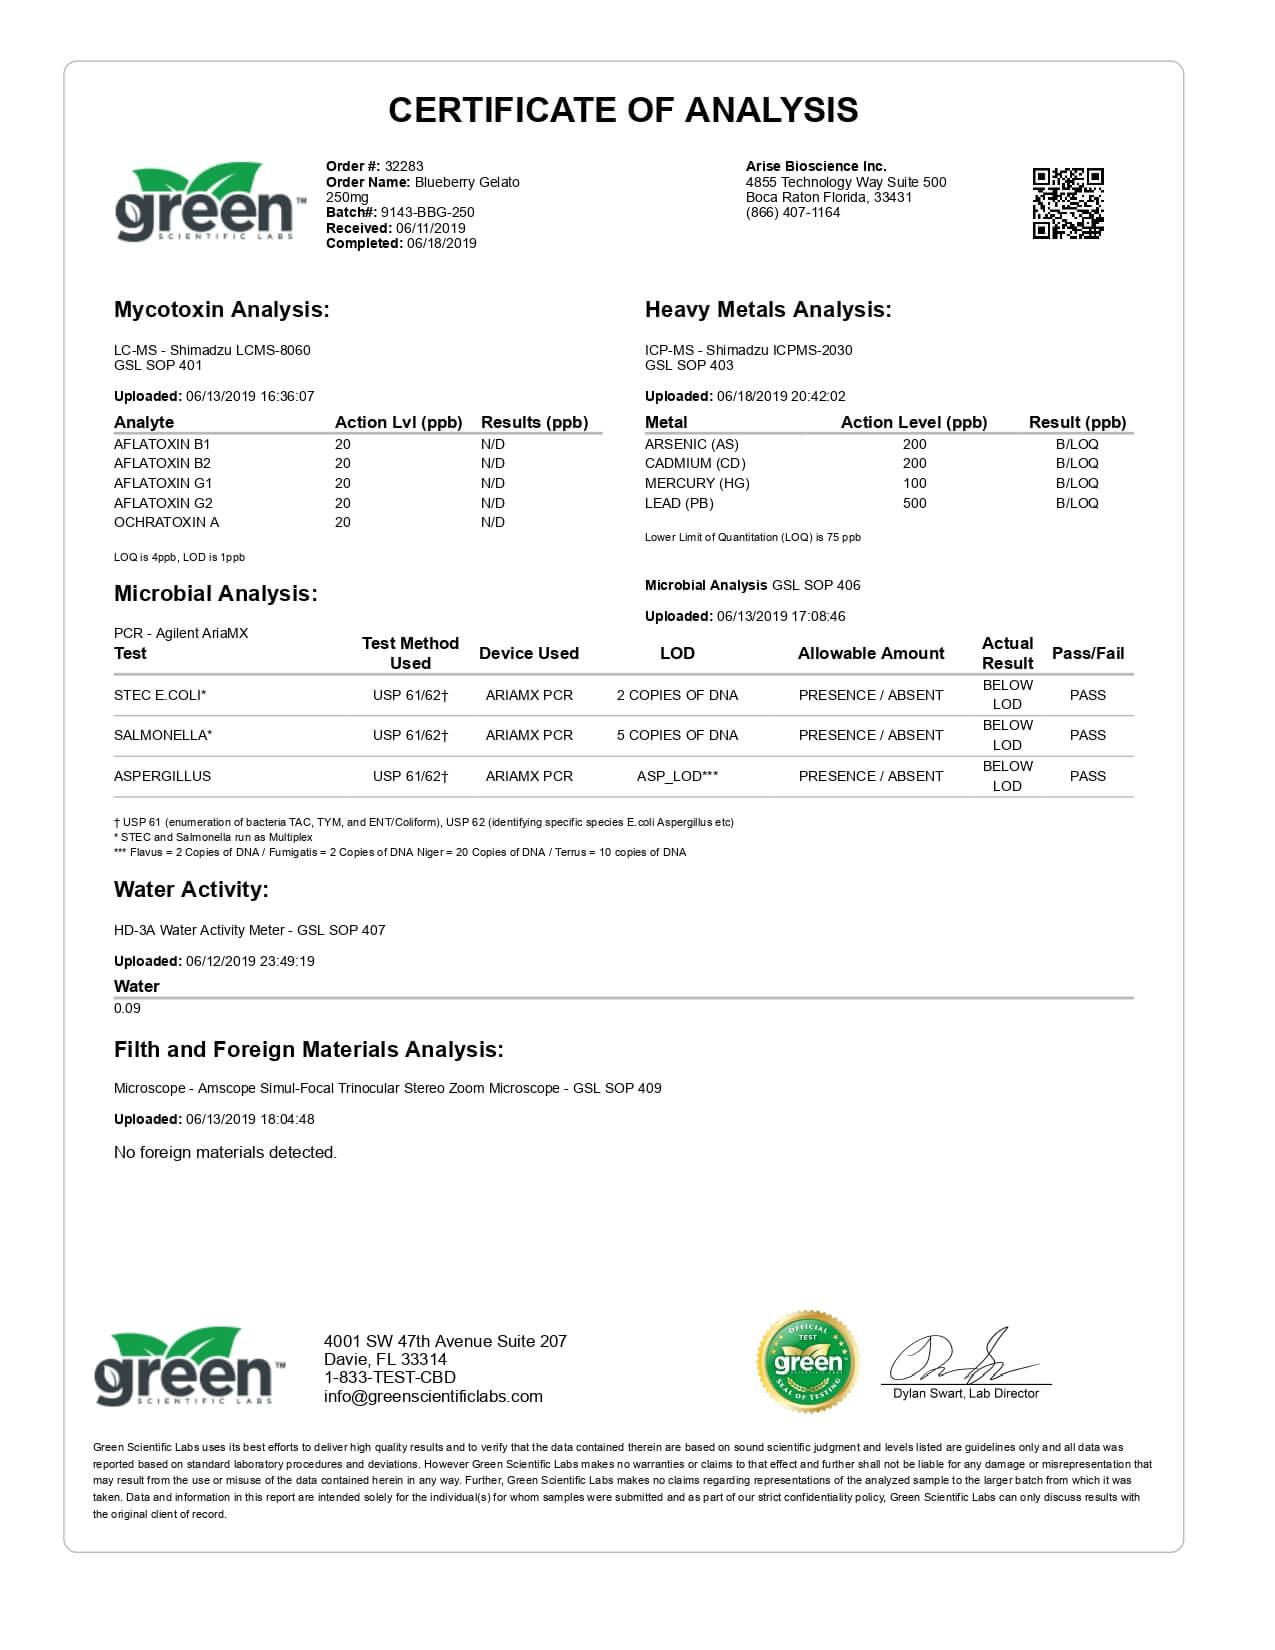 Funky Farms CBD Vape Blueberry Gelato 250mg Lab Report